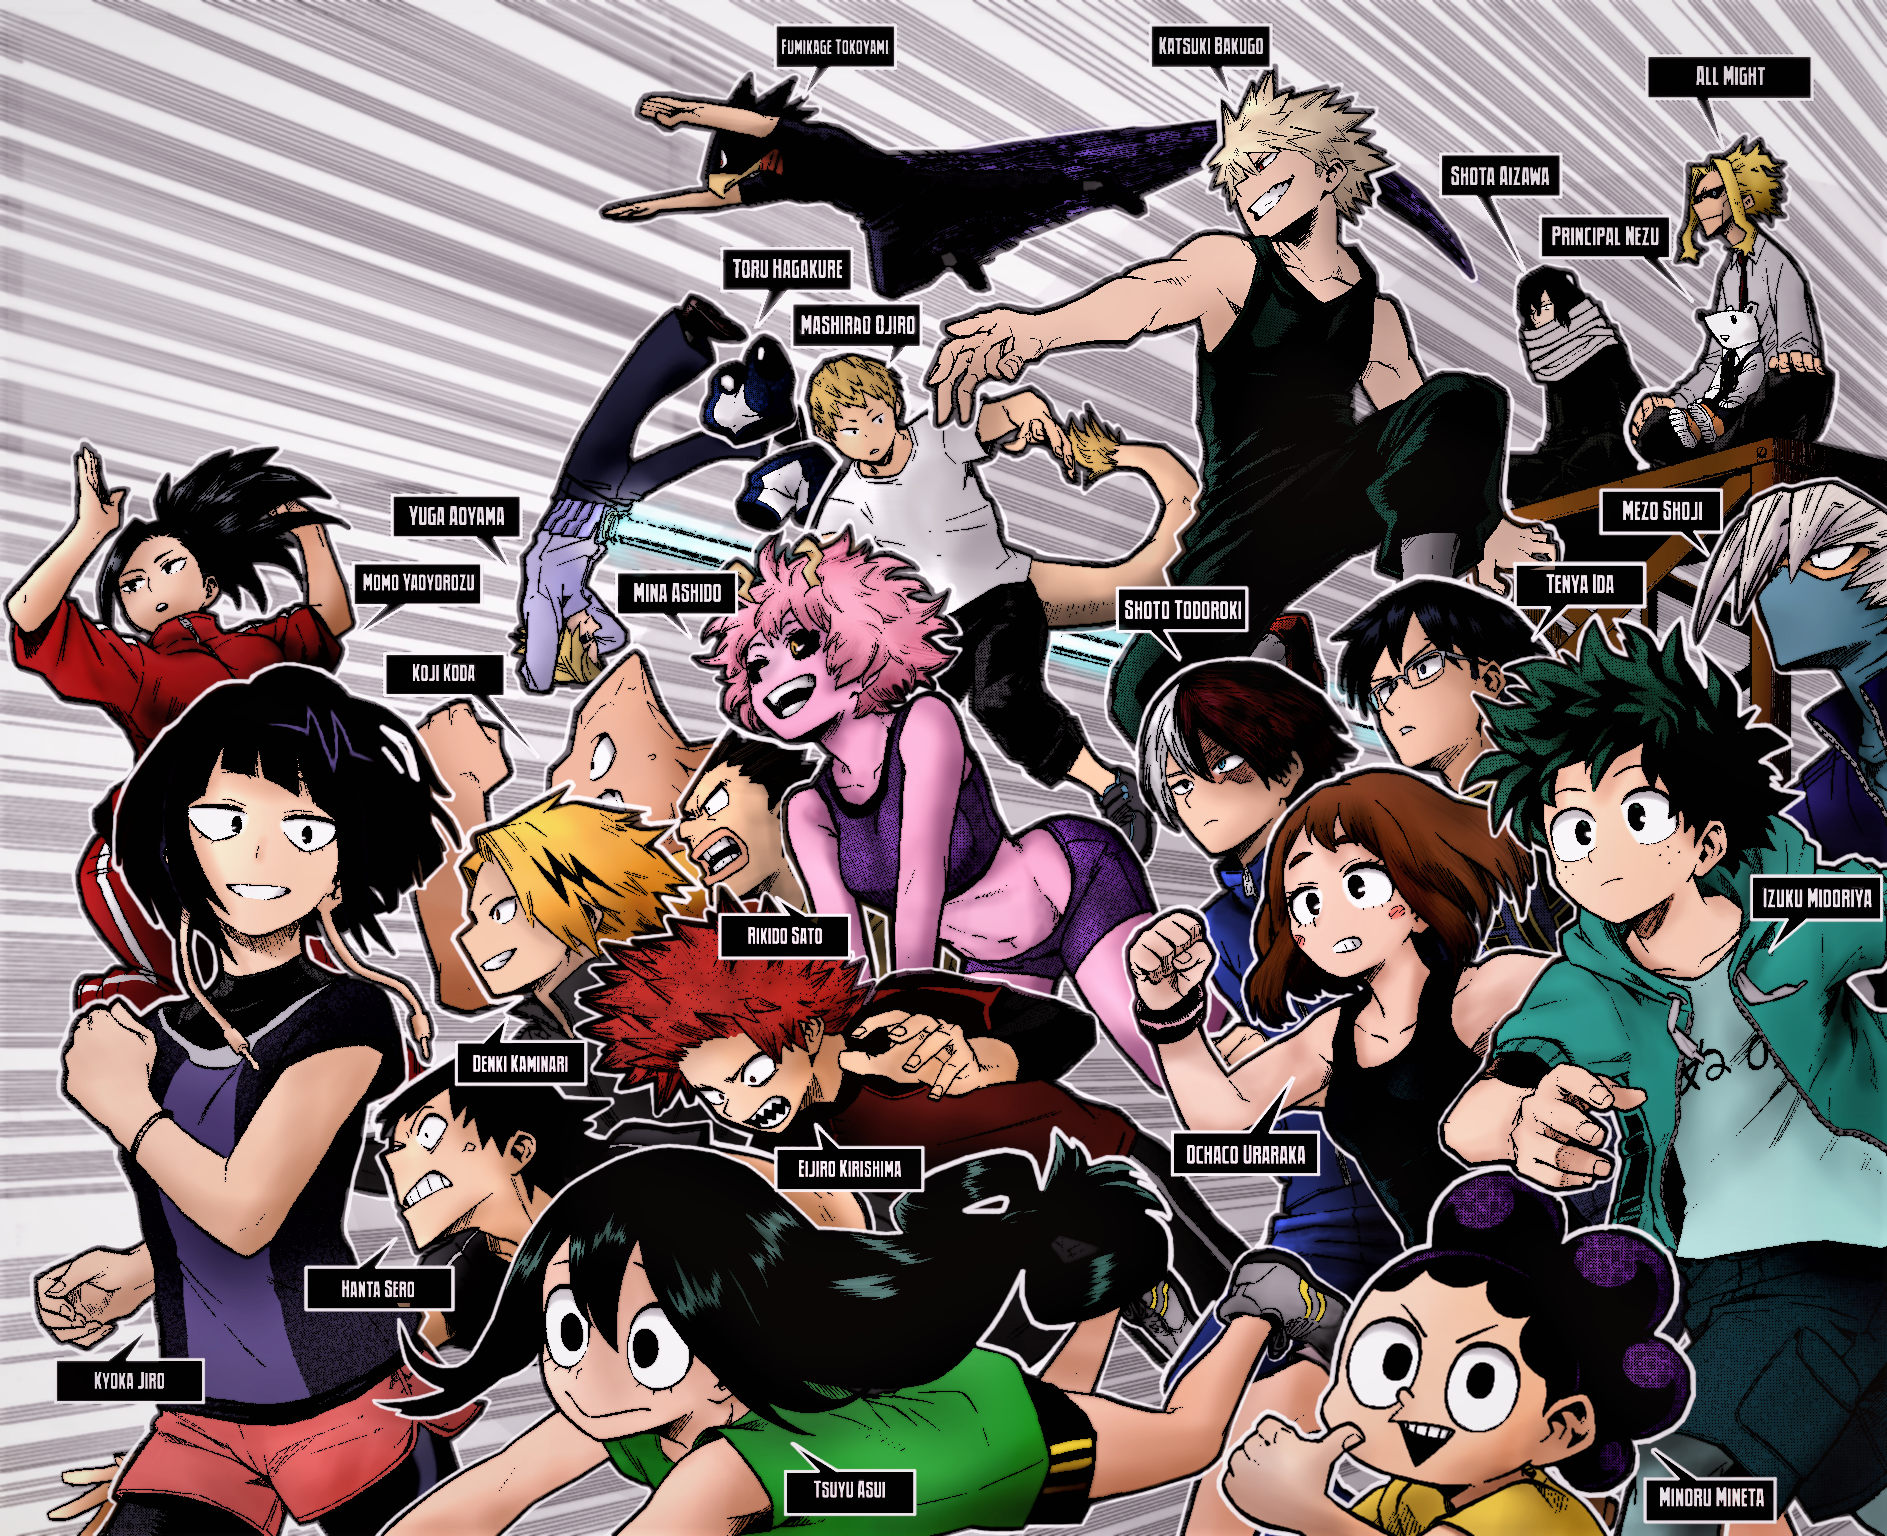 U A High School Class 1 A Manga To Color By Me Bokunoheroacademia My Hero My Hero Academia Episodes Anime